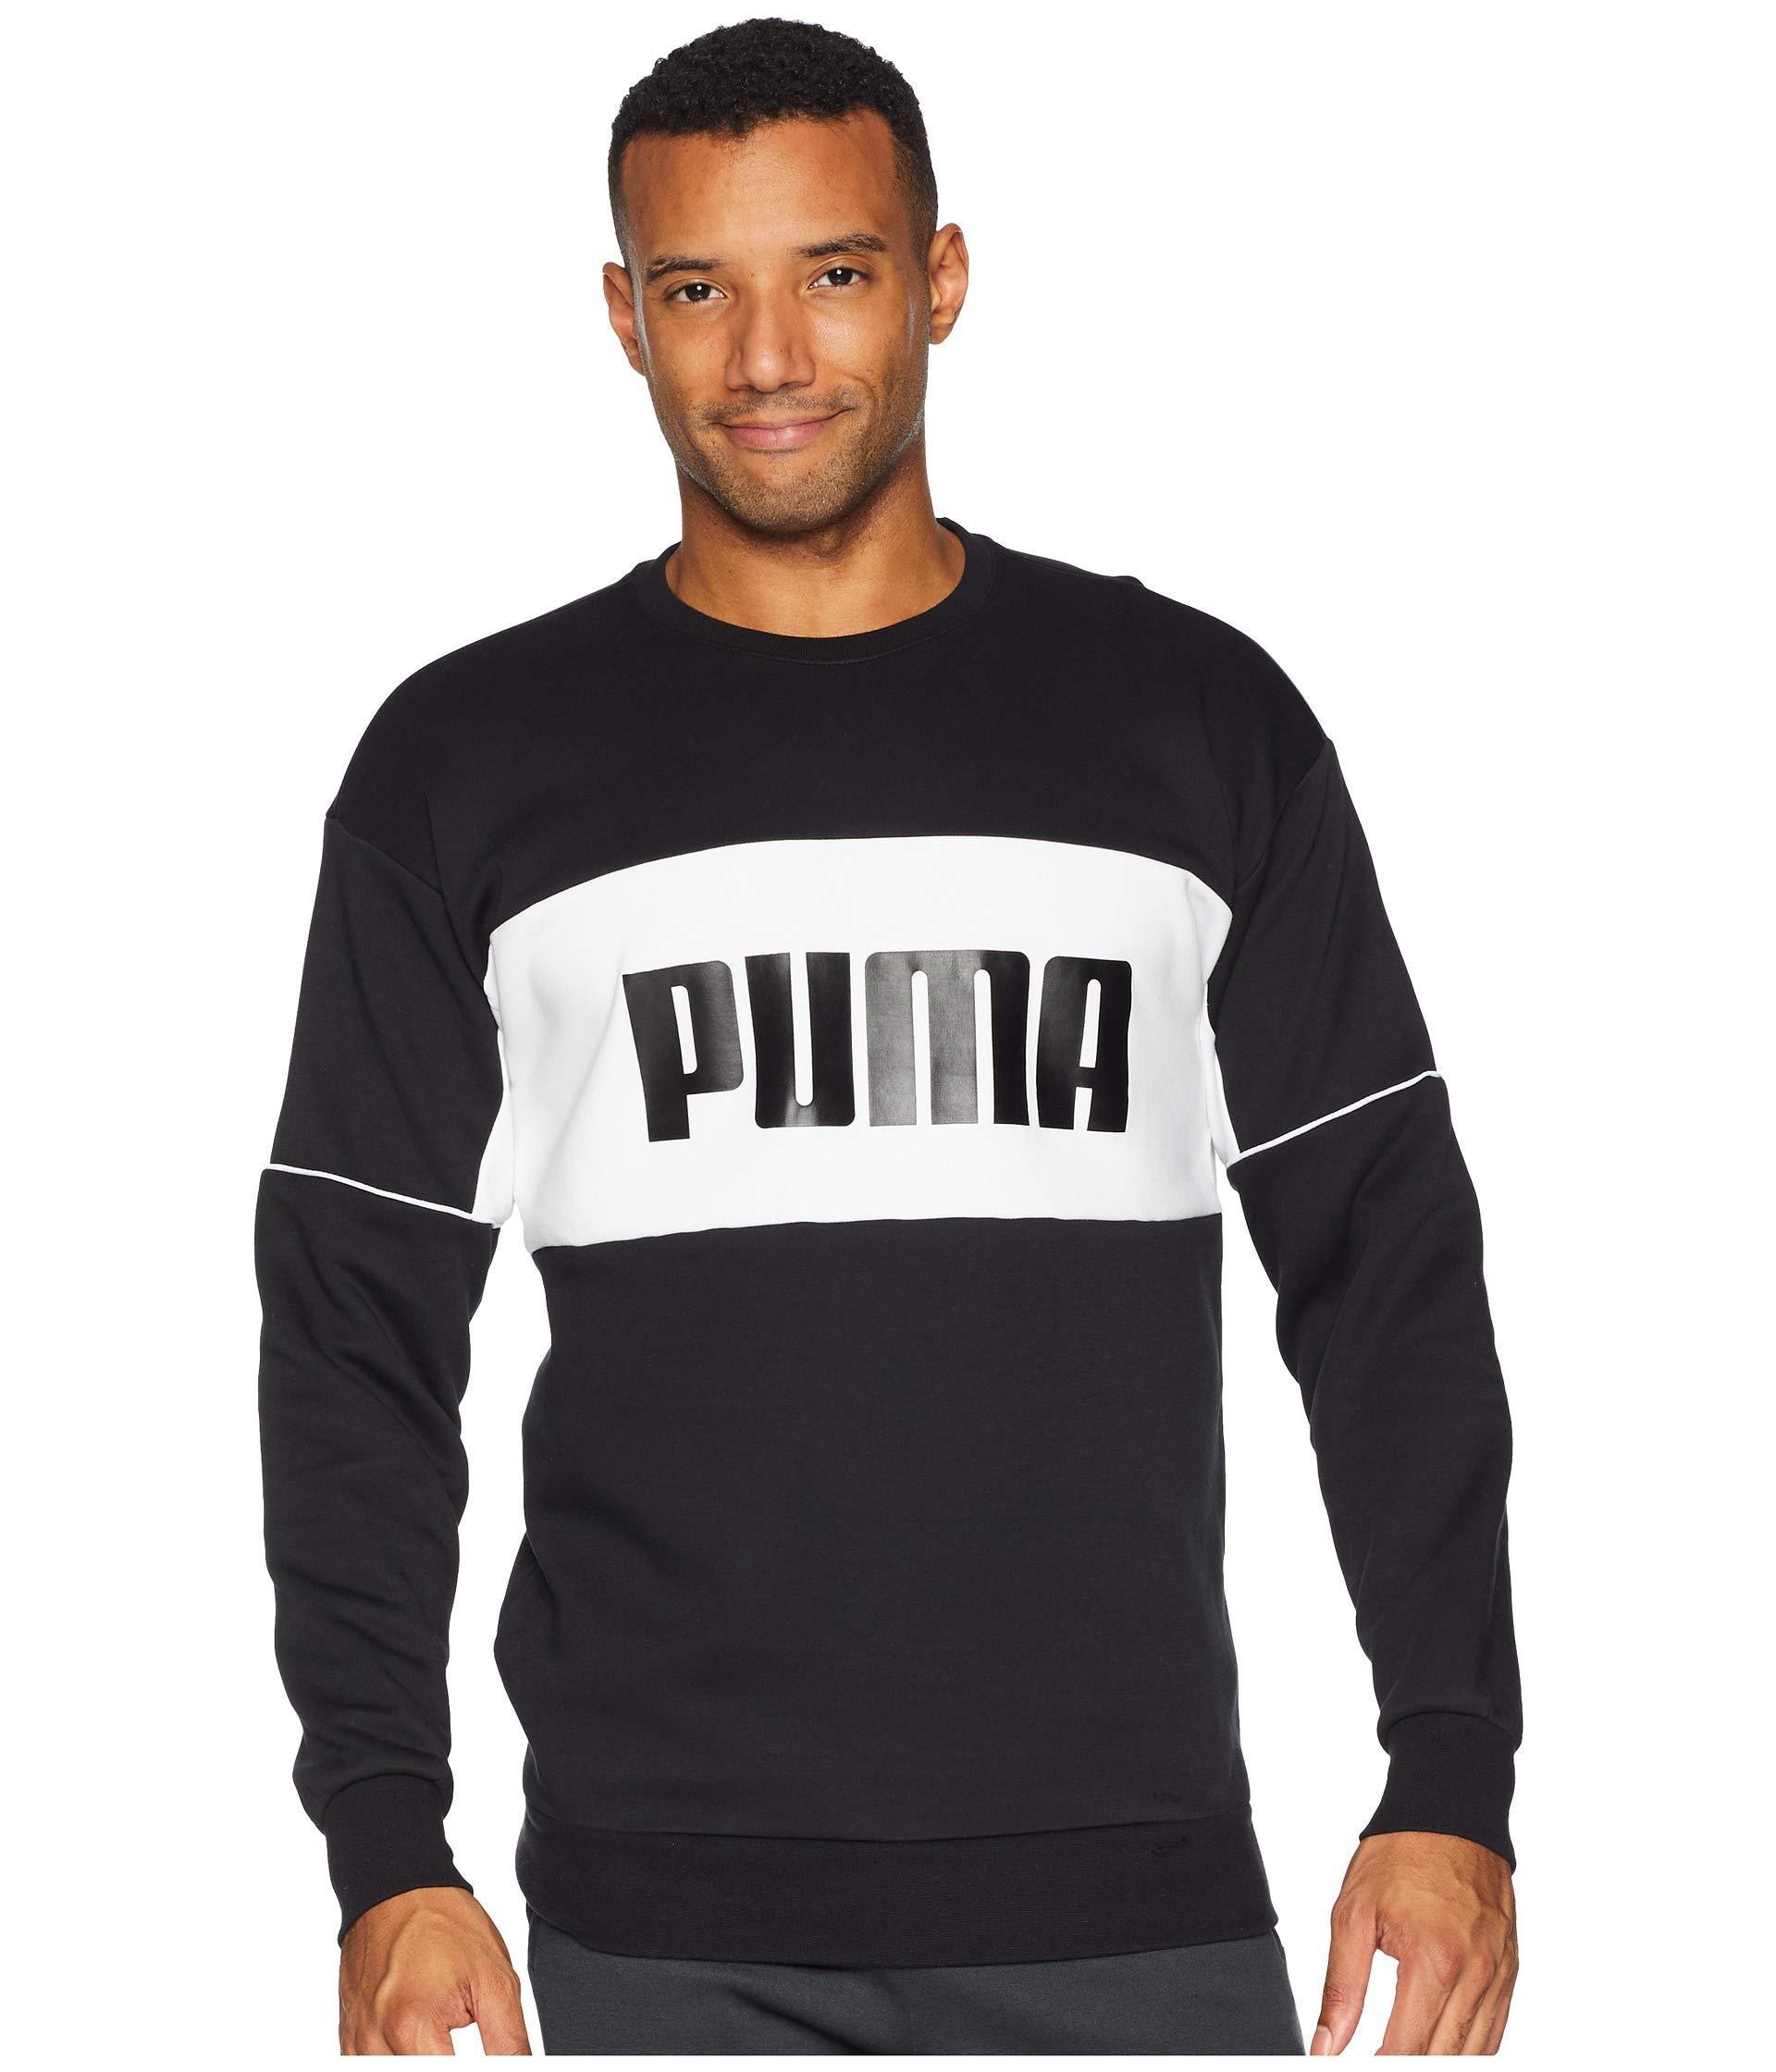 1320ab1cfbaaf7 Lyst - PUMA Retro Crew Neck Sweatshirt in Black for Men - Save 69%